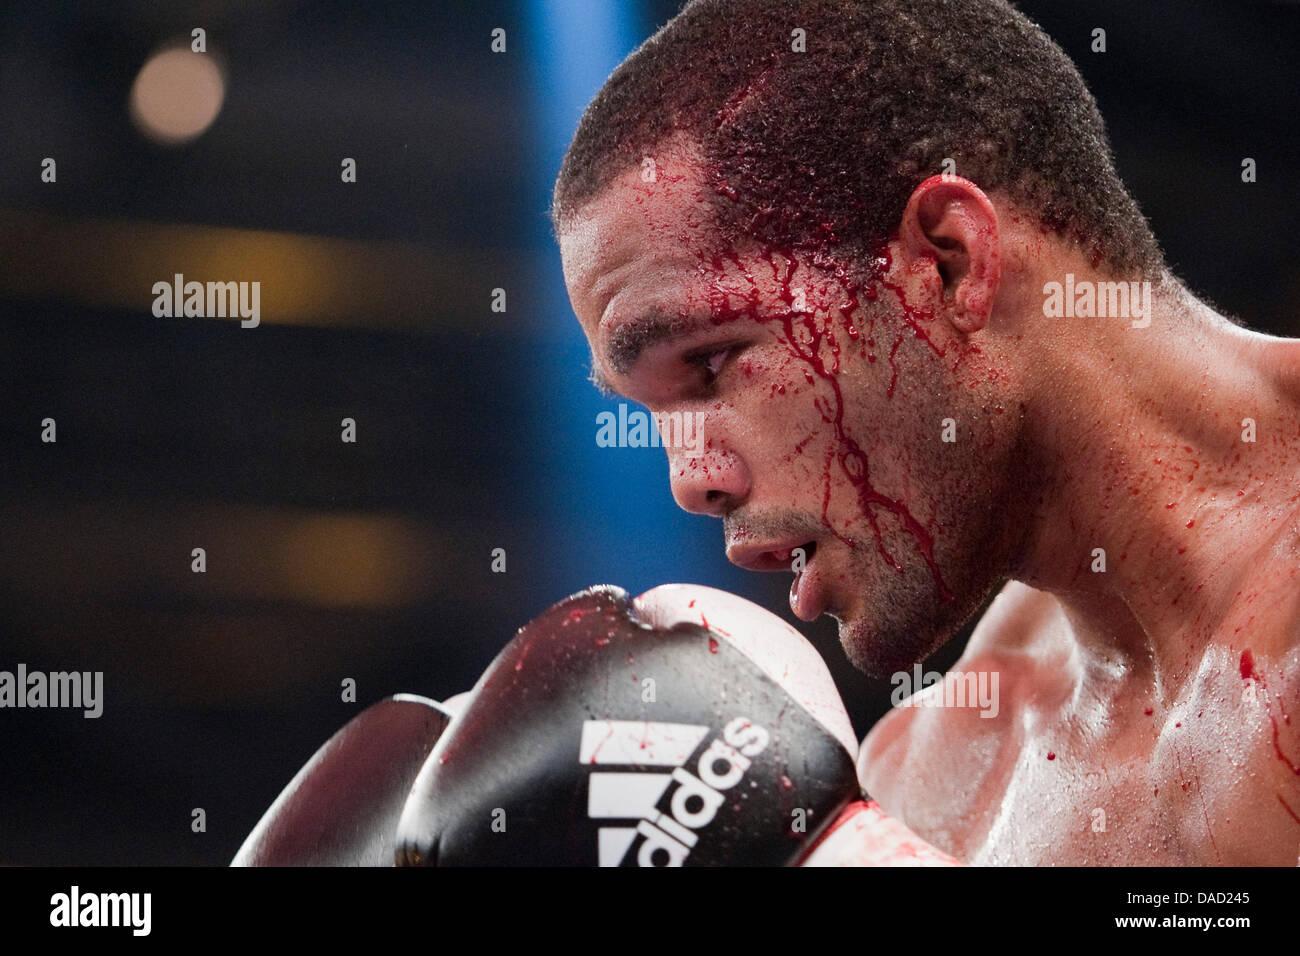 Cuban boxer Yoan Pablo Hernandez bleeds during the IBF Cruiserweight World Championship-fight in Neubrandenburg, - Stock Image